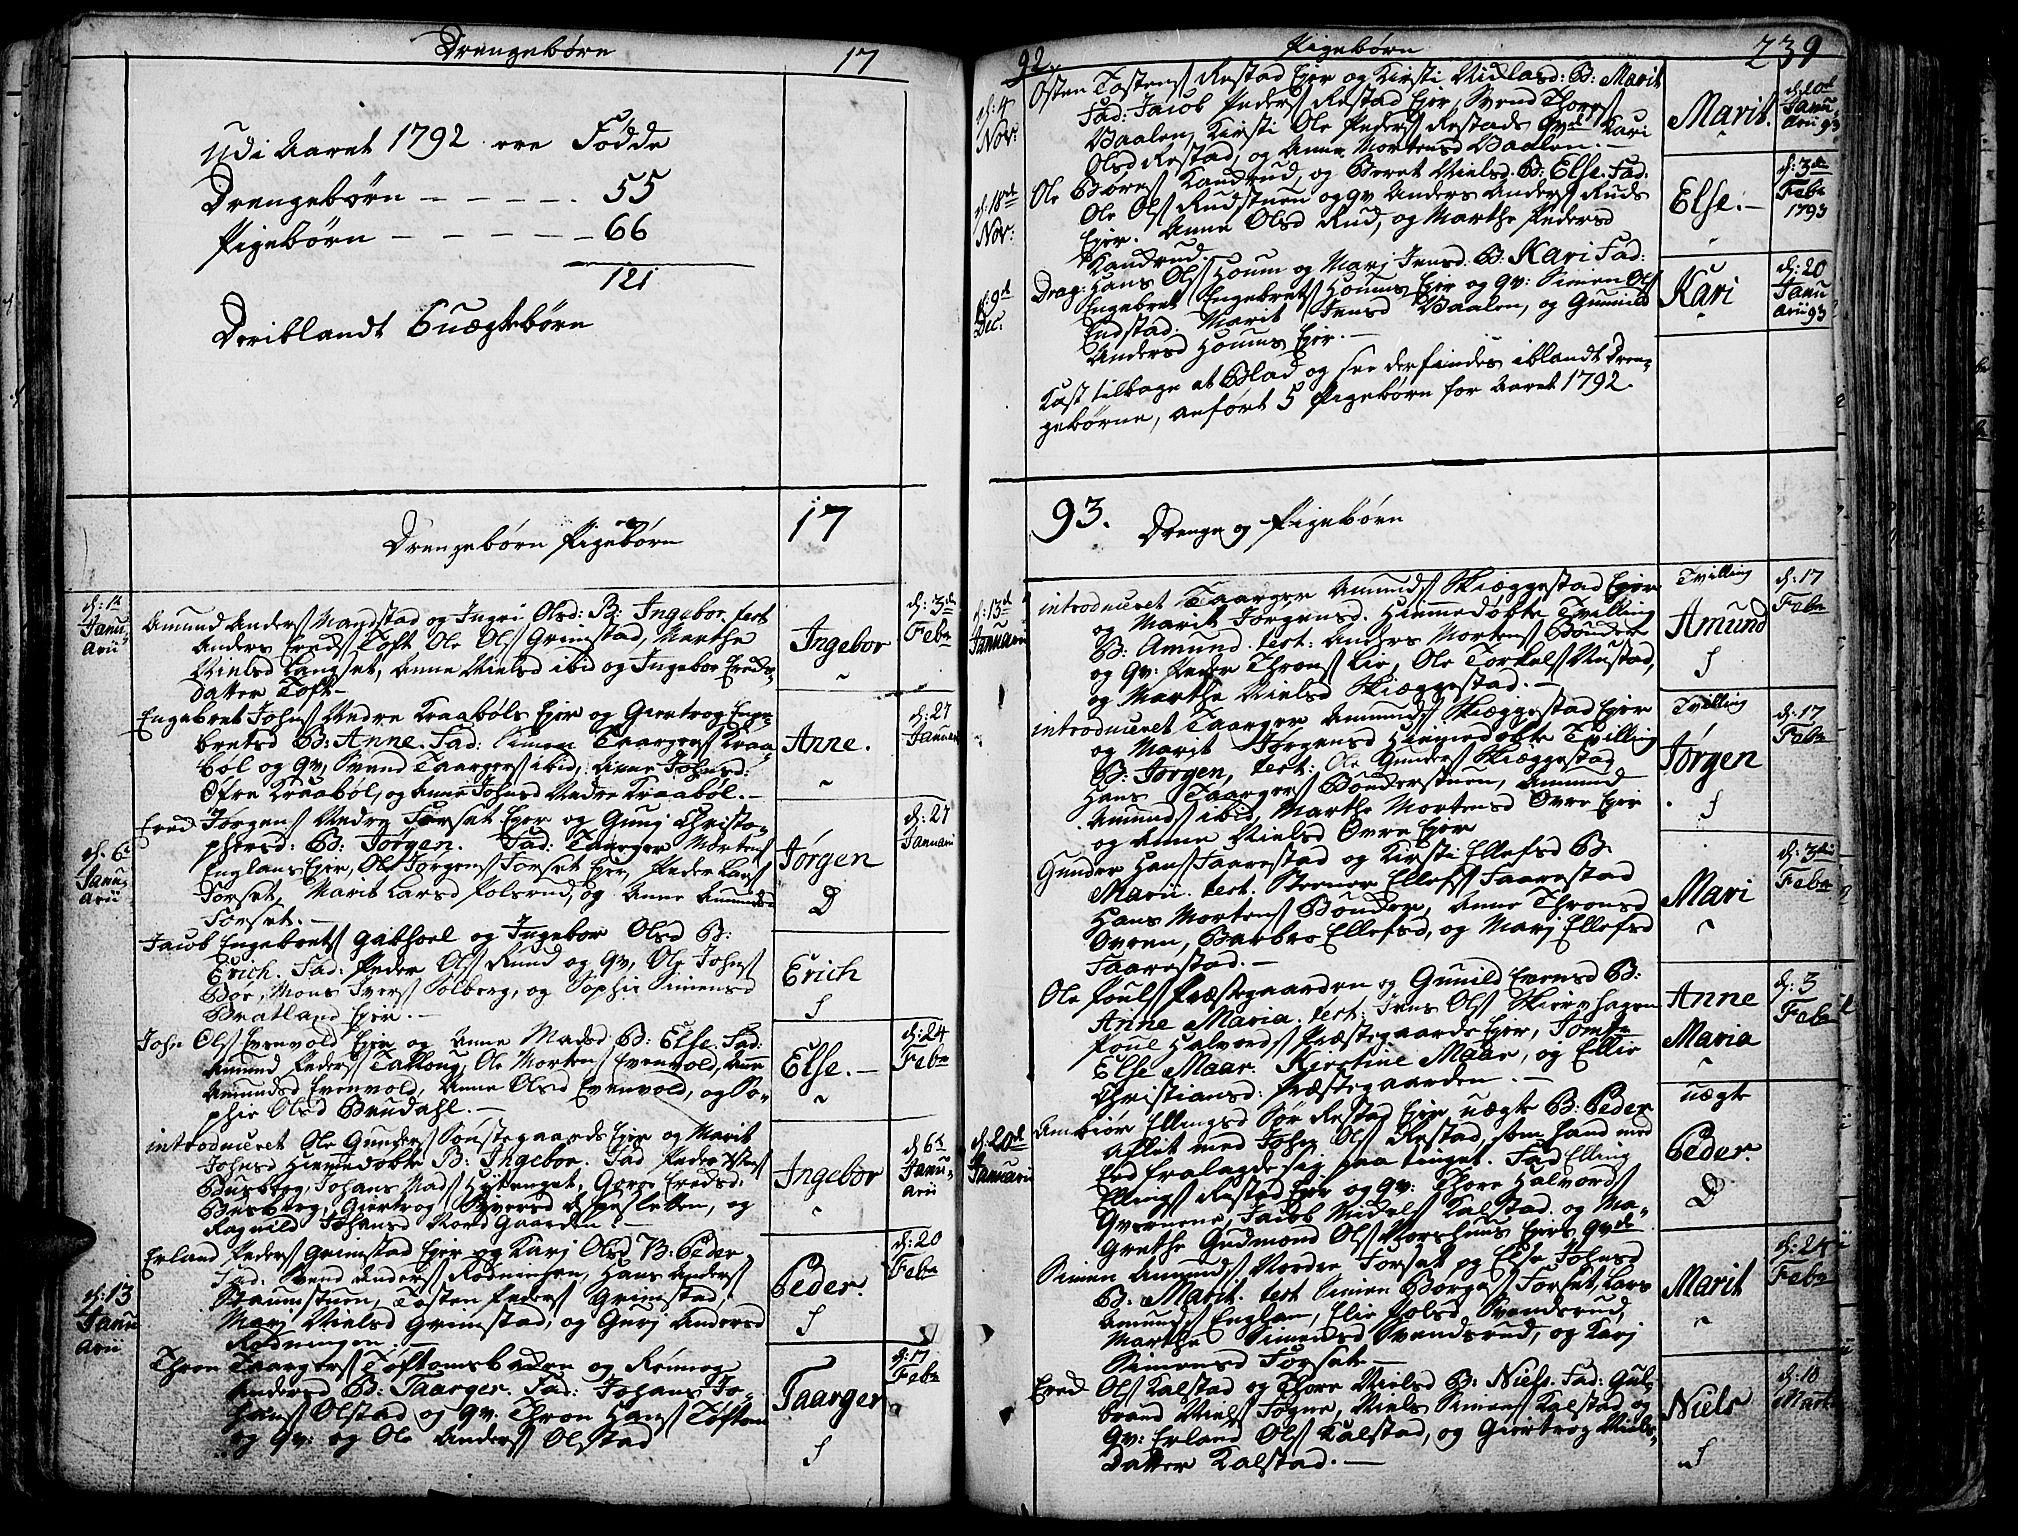 SAH, Gausdal prestekontor, Ministerialbok nr. 3, 1758-1809, s. 239